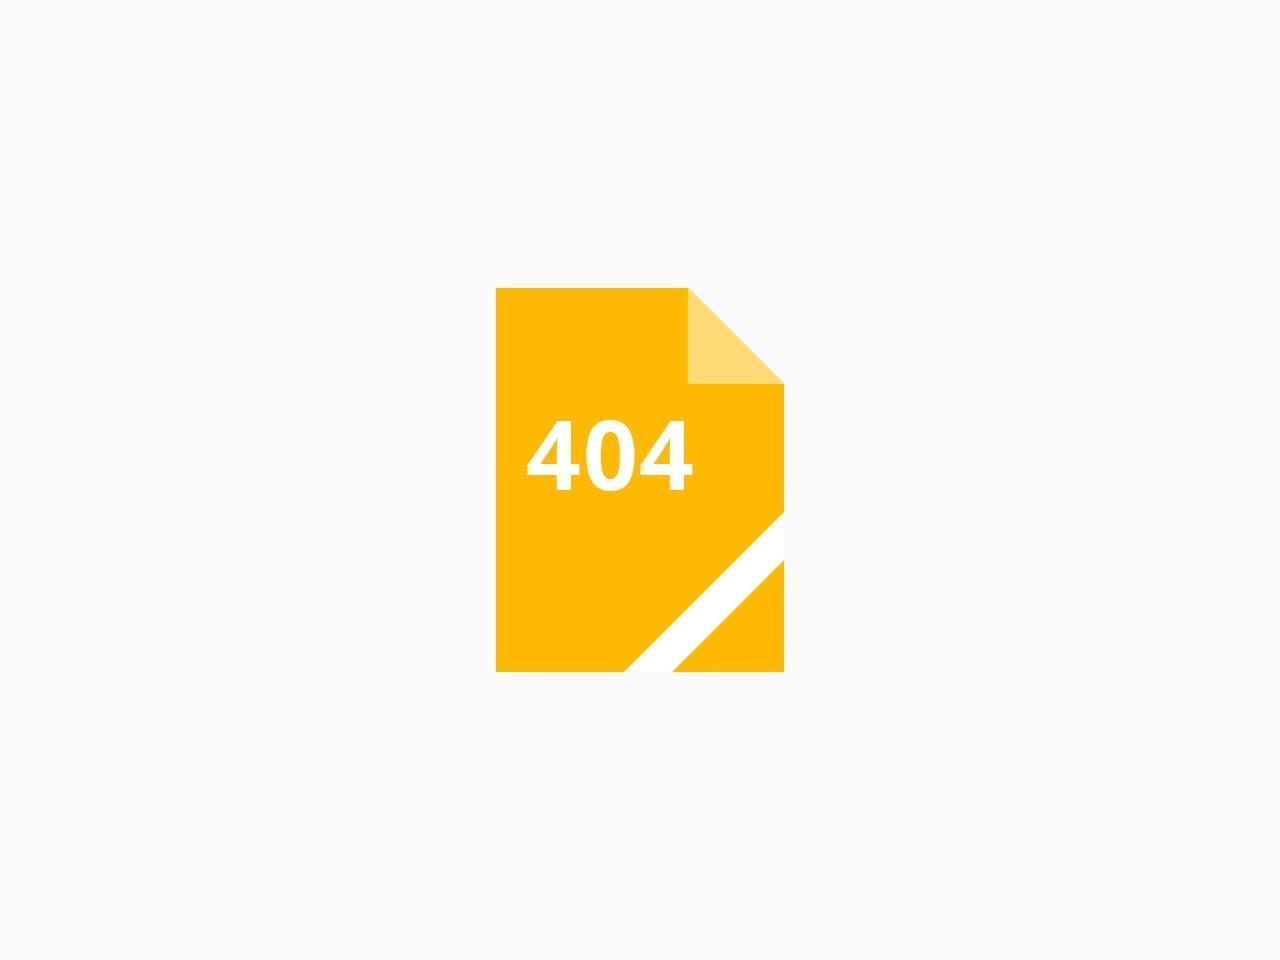 365医学网